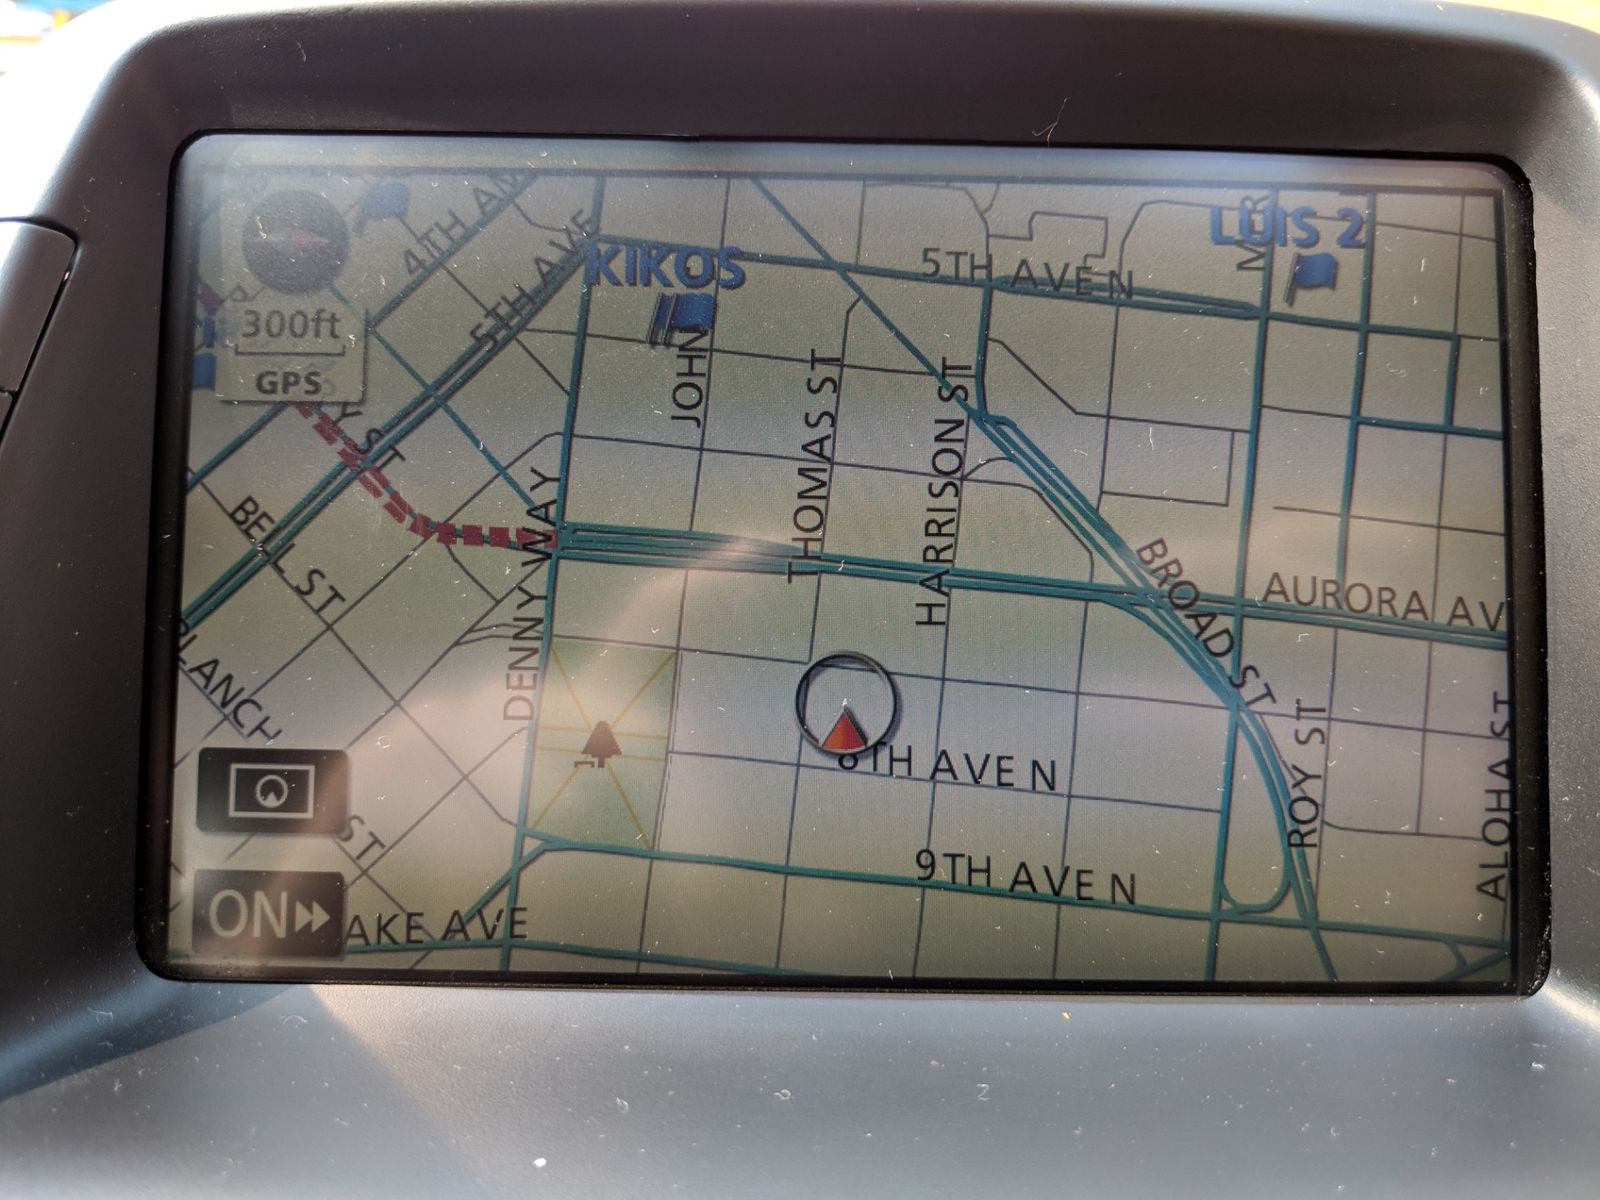 2009 prius navigation system update